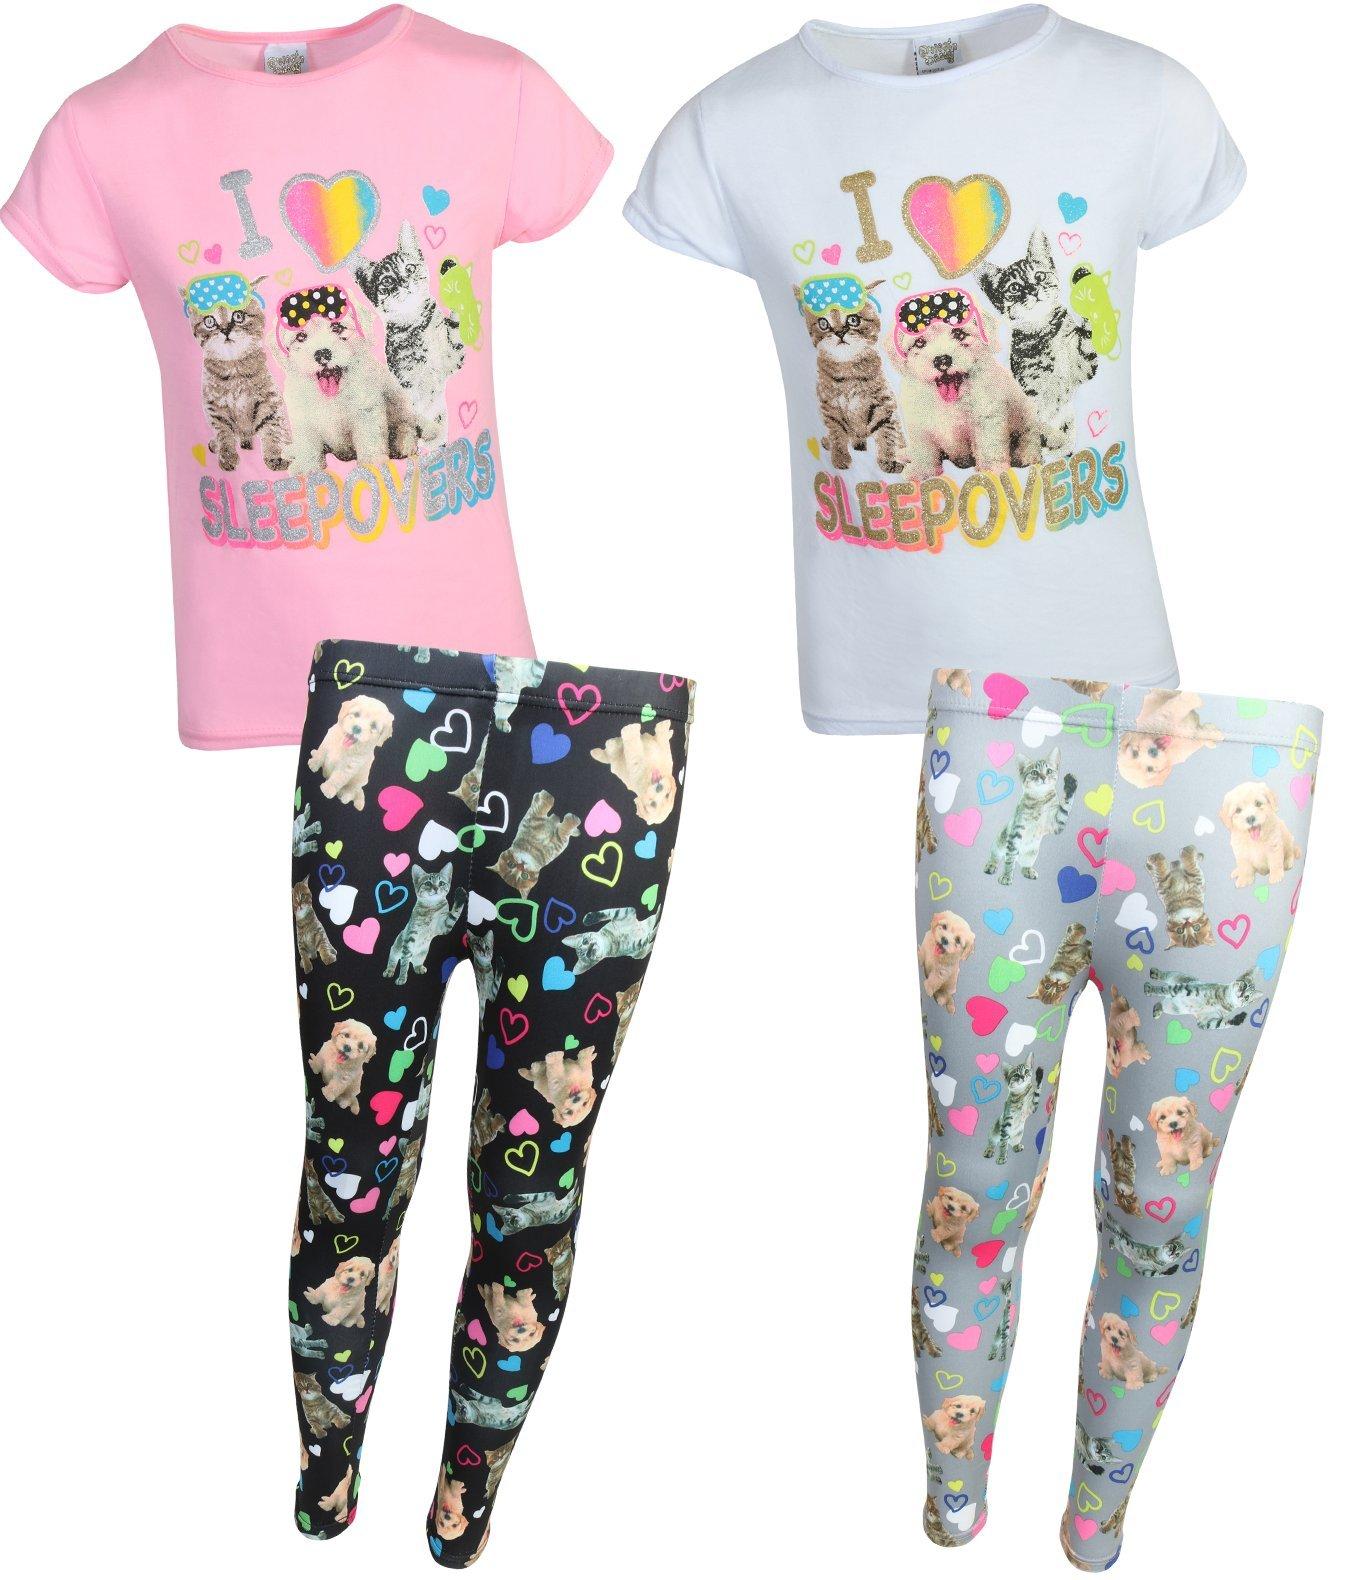 Sweet & Sassy Girls' Pajama Top with Legging Pants (2 Pack), Sleepovers, Size 5-6'